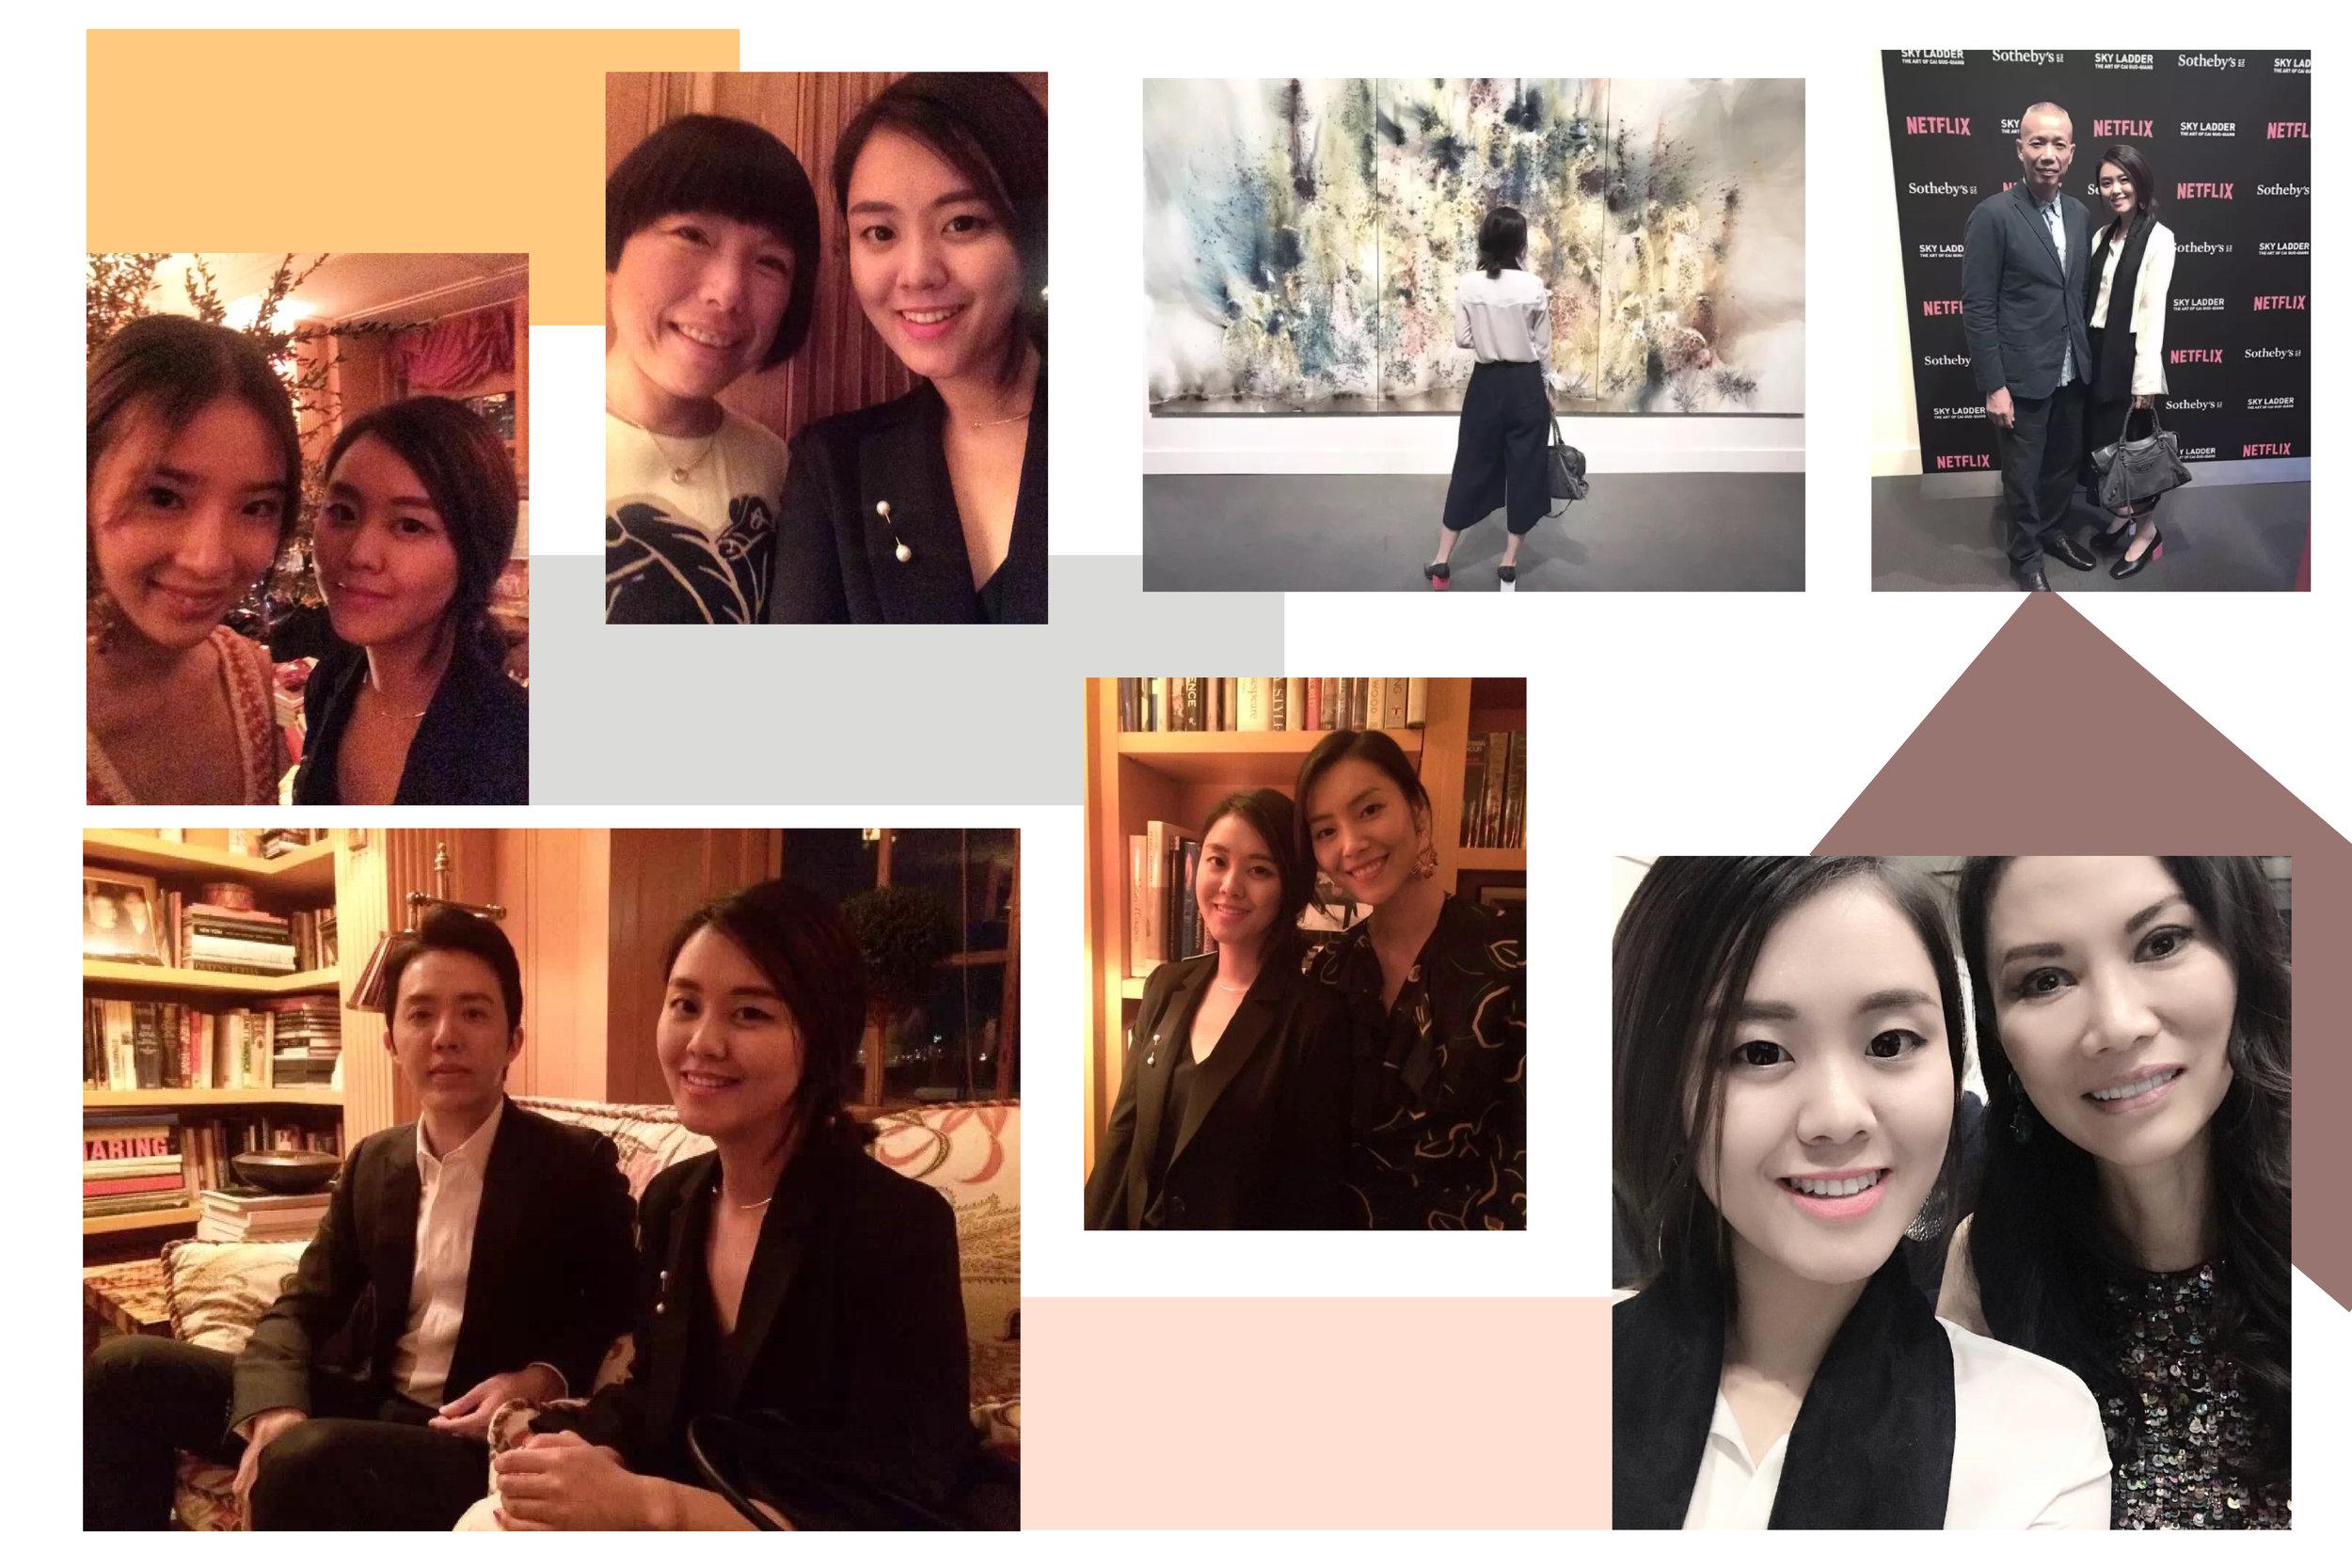 - Yuki與亞洲時尚博主Irene Kim、超模劉雯、音樂神童李雲迪、Vogue總編張宇、國際總裁鄧文迪、爆破大師蔡國強等名人合作之合影。